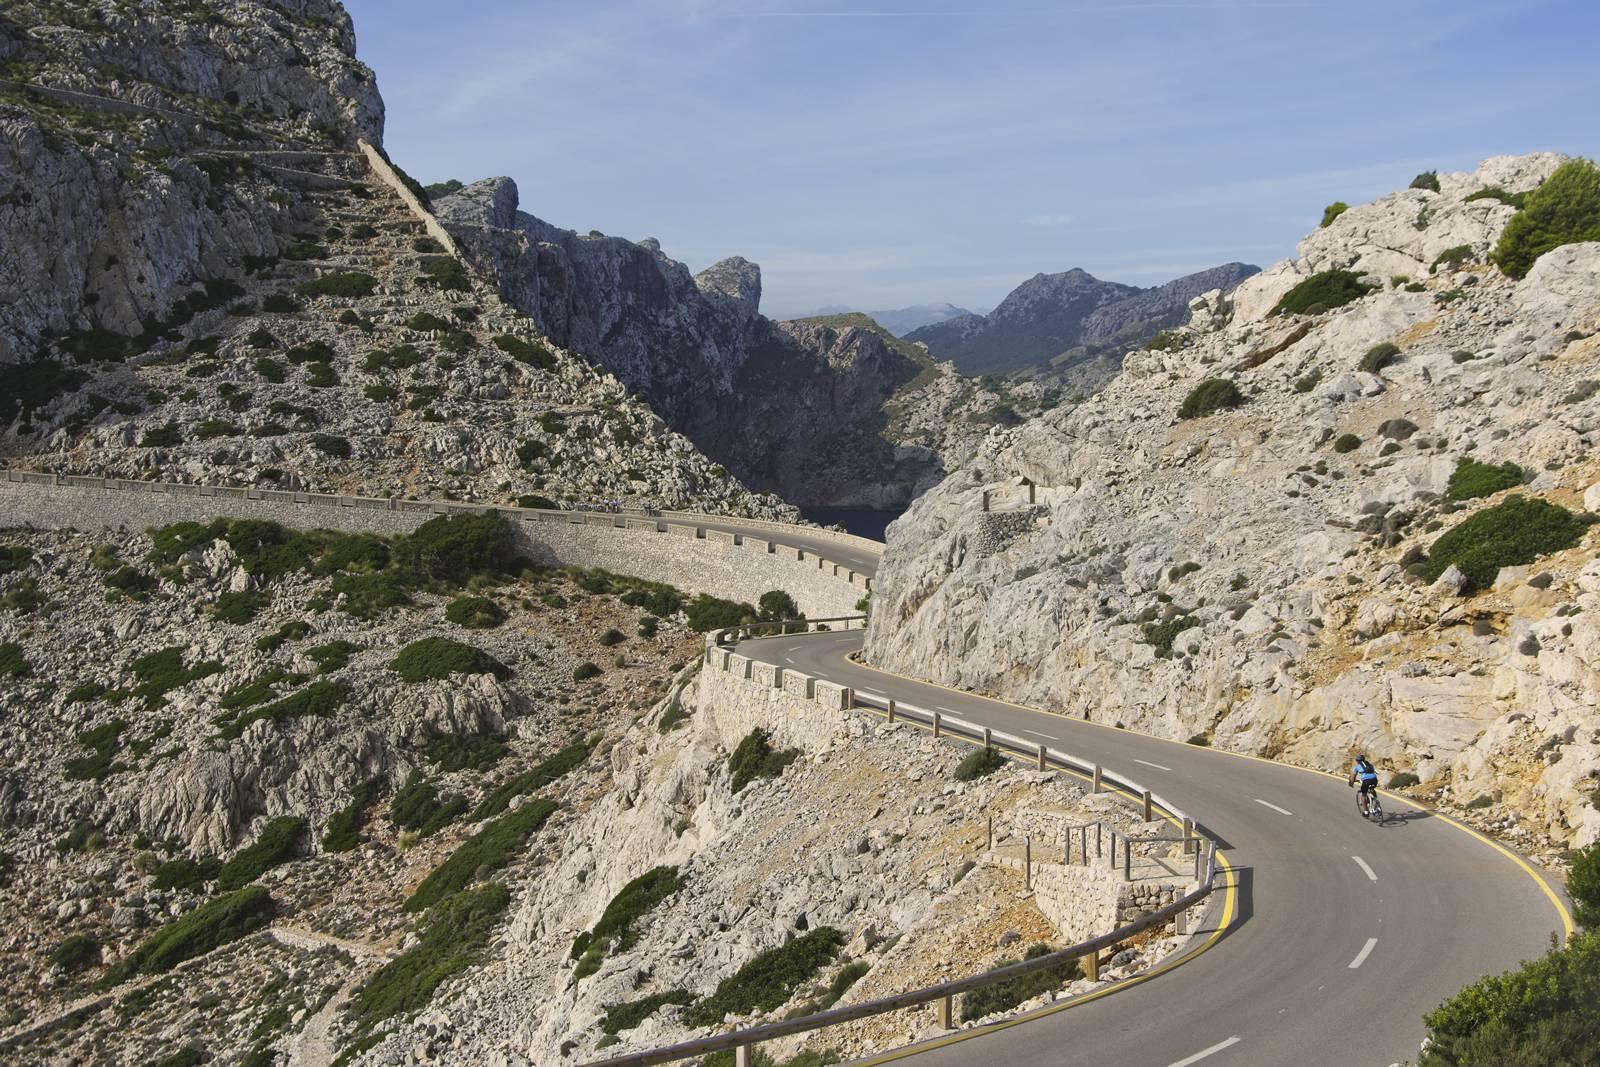 Droga na Formentor majorka rowerem